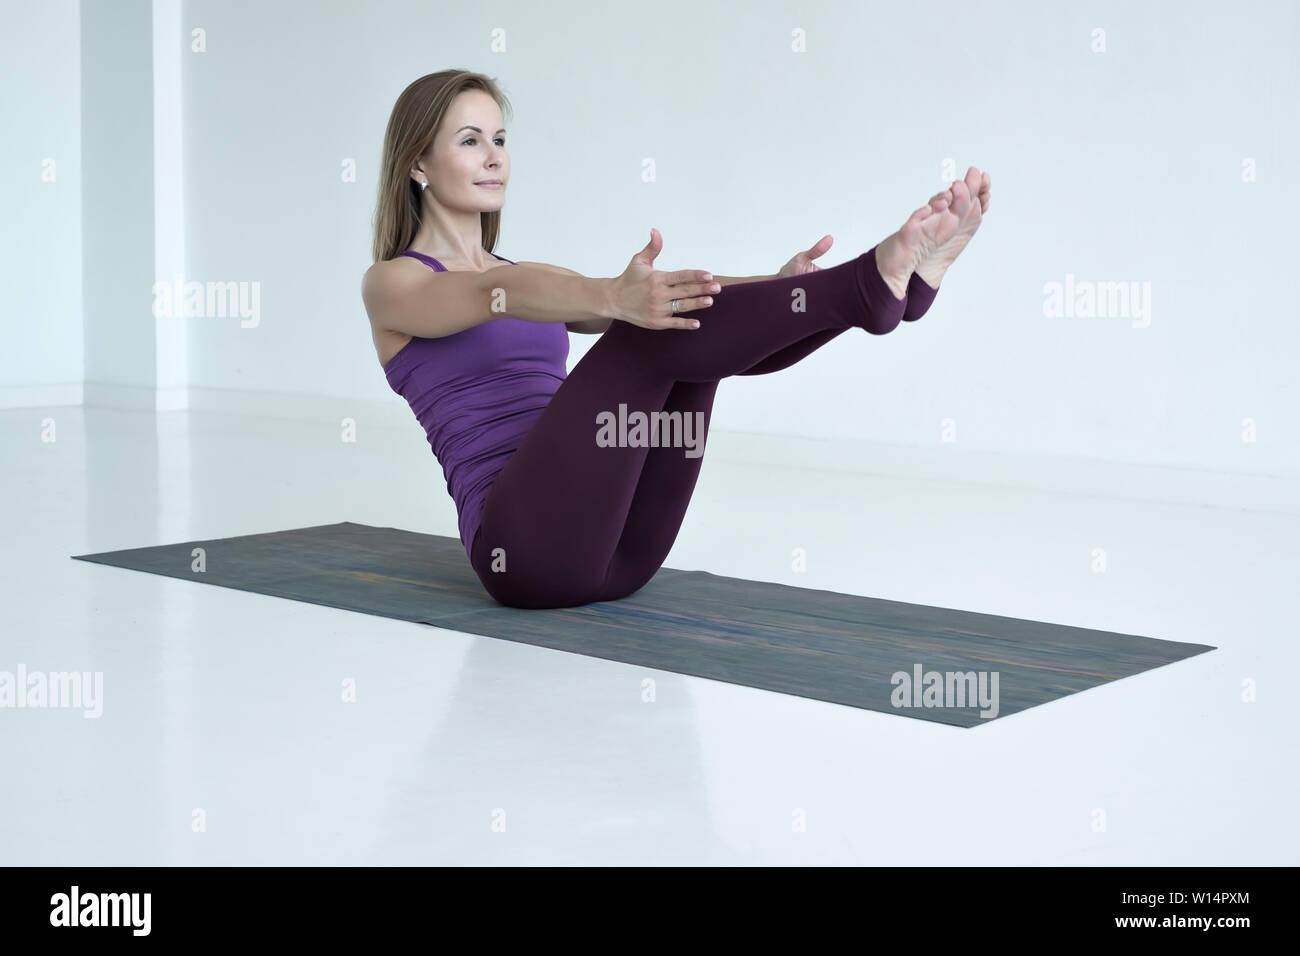 Woman practicing yoga, doing Paripurna Navasana exercise, boat pos - Stock Image